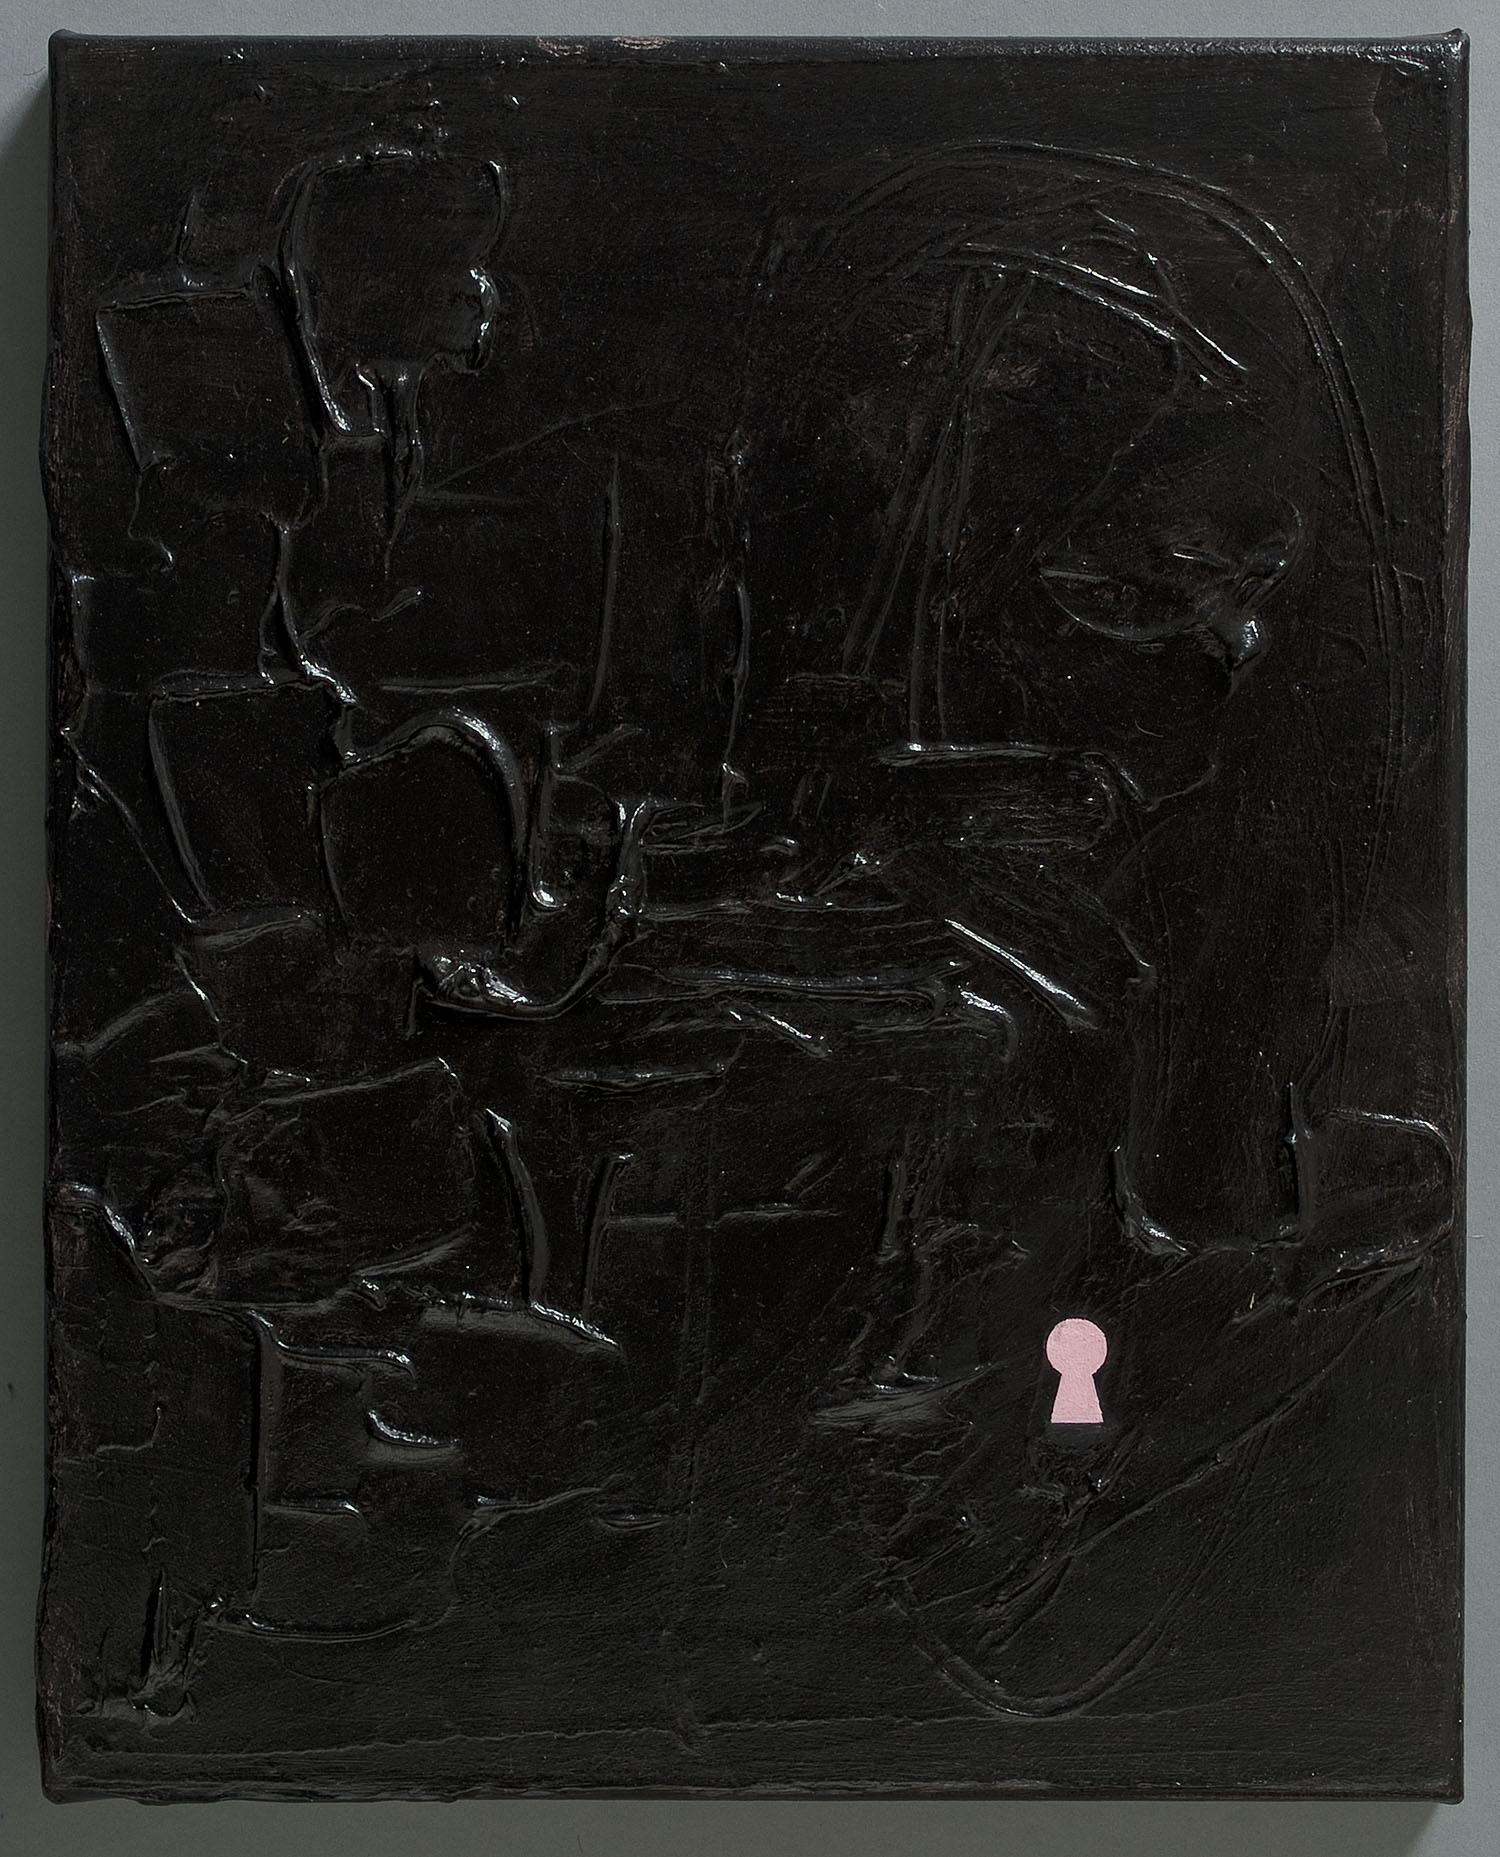 Slit Scenes | 2011 | Acryl und Öl auf Leinwand | 40 x 32 cm | Acryl und Öl auf Leinwand